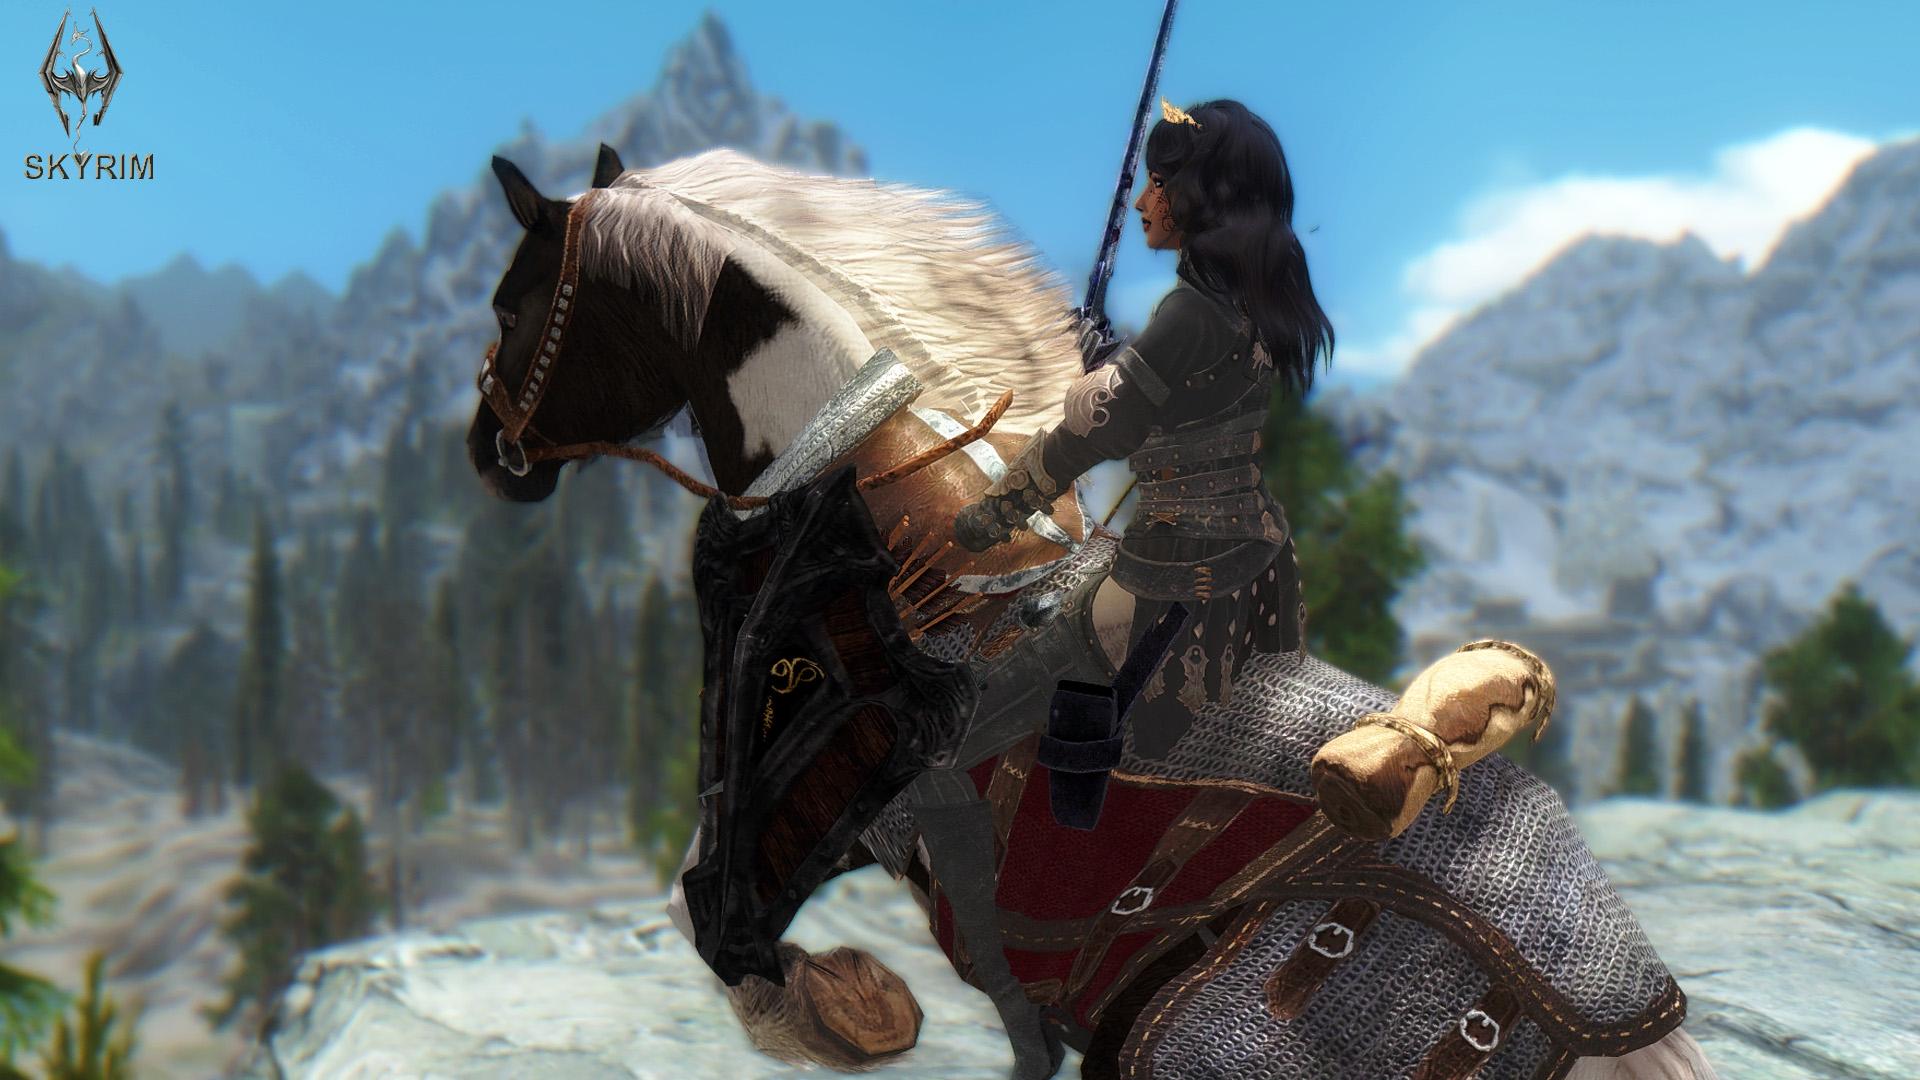 061. На коне.jpg - Elder Scrolls 5: Skyrim, the CBBE, Сборка-21